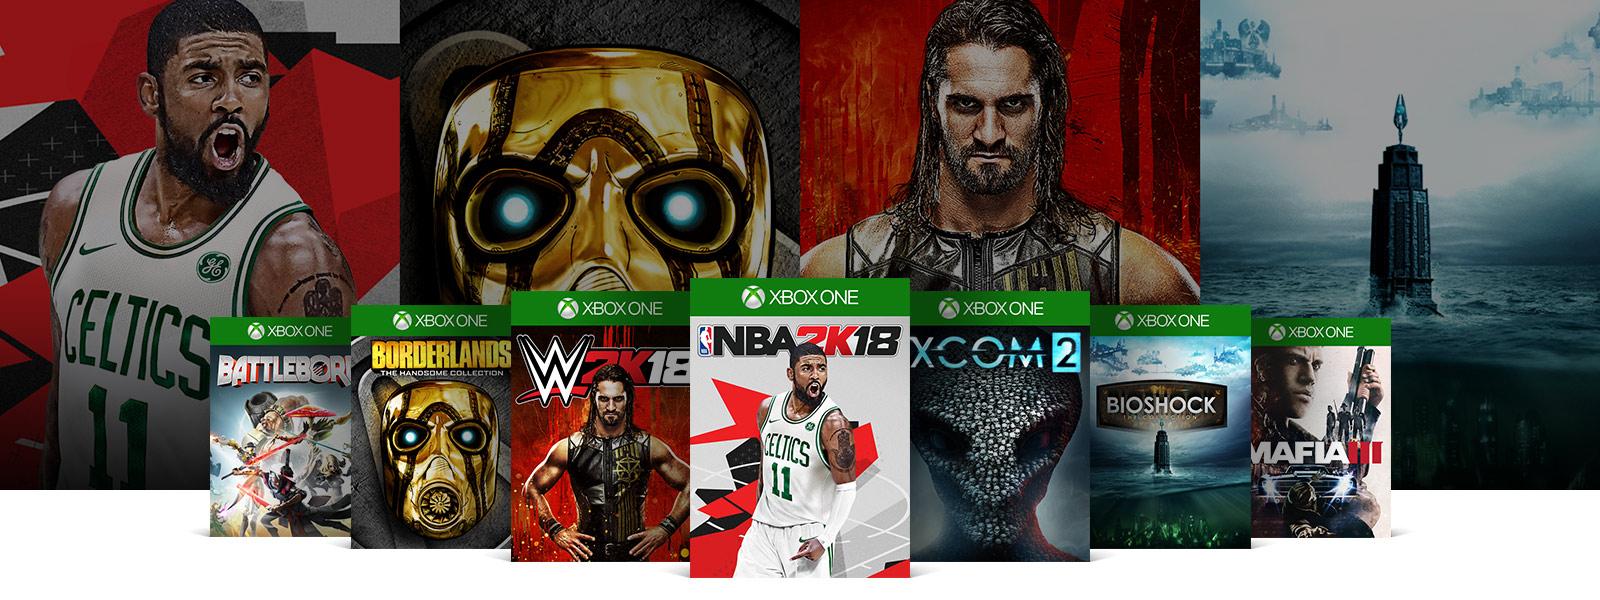 Xbox game boxshots of Battleborn Borderlands W2K18 NBA 2K18 XCOM 2 Bioshock Mafia 3